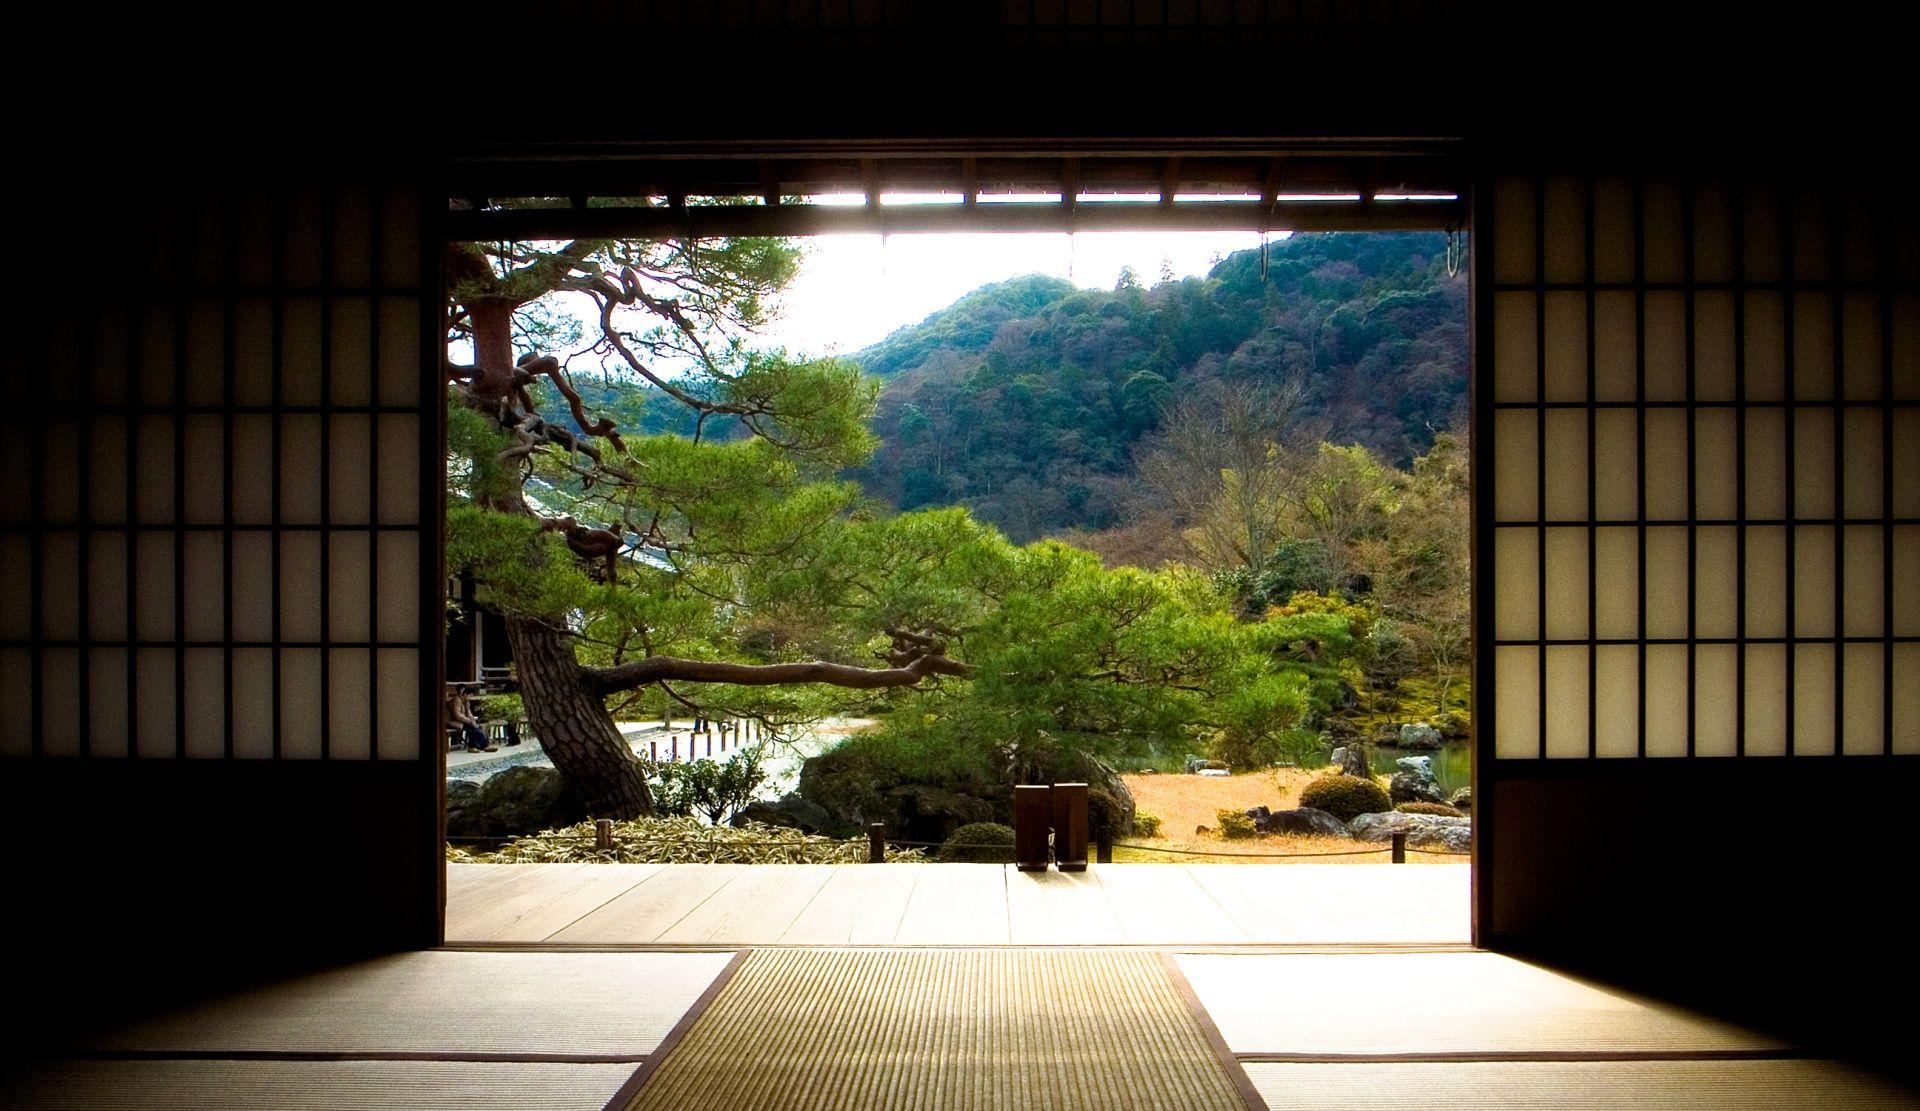 50 Buddha Quotes To Get You Through Life